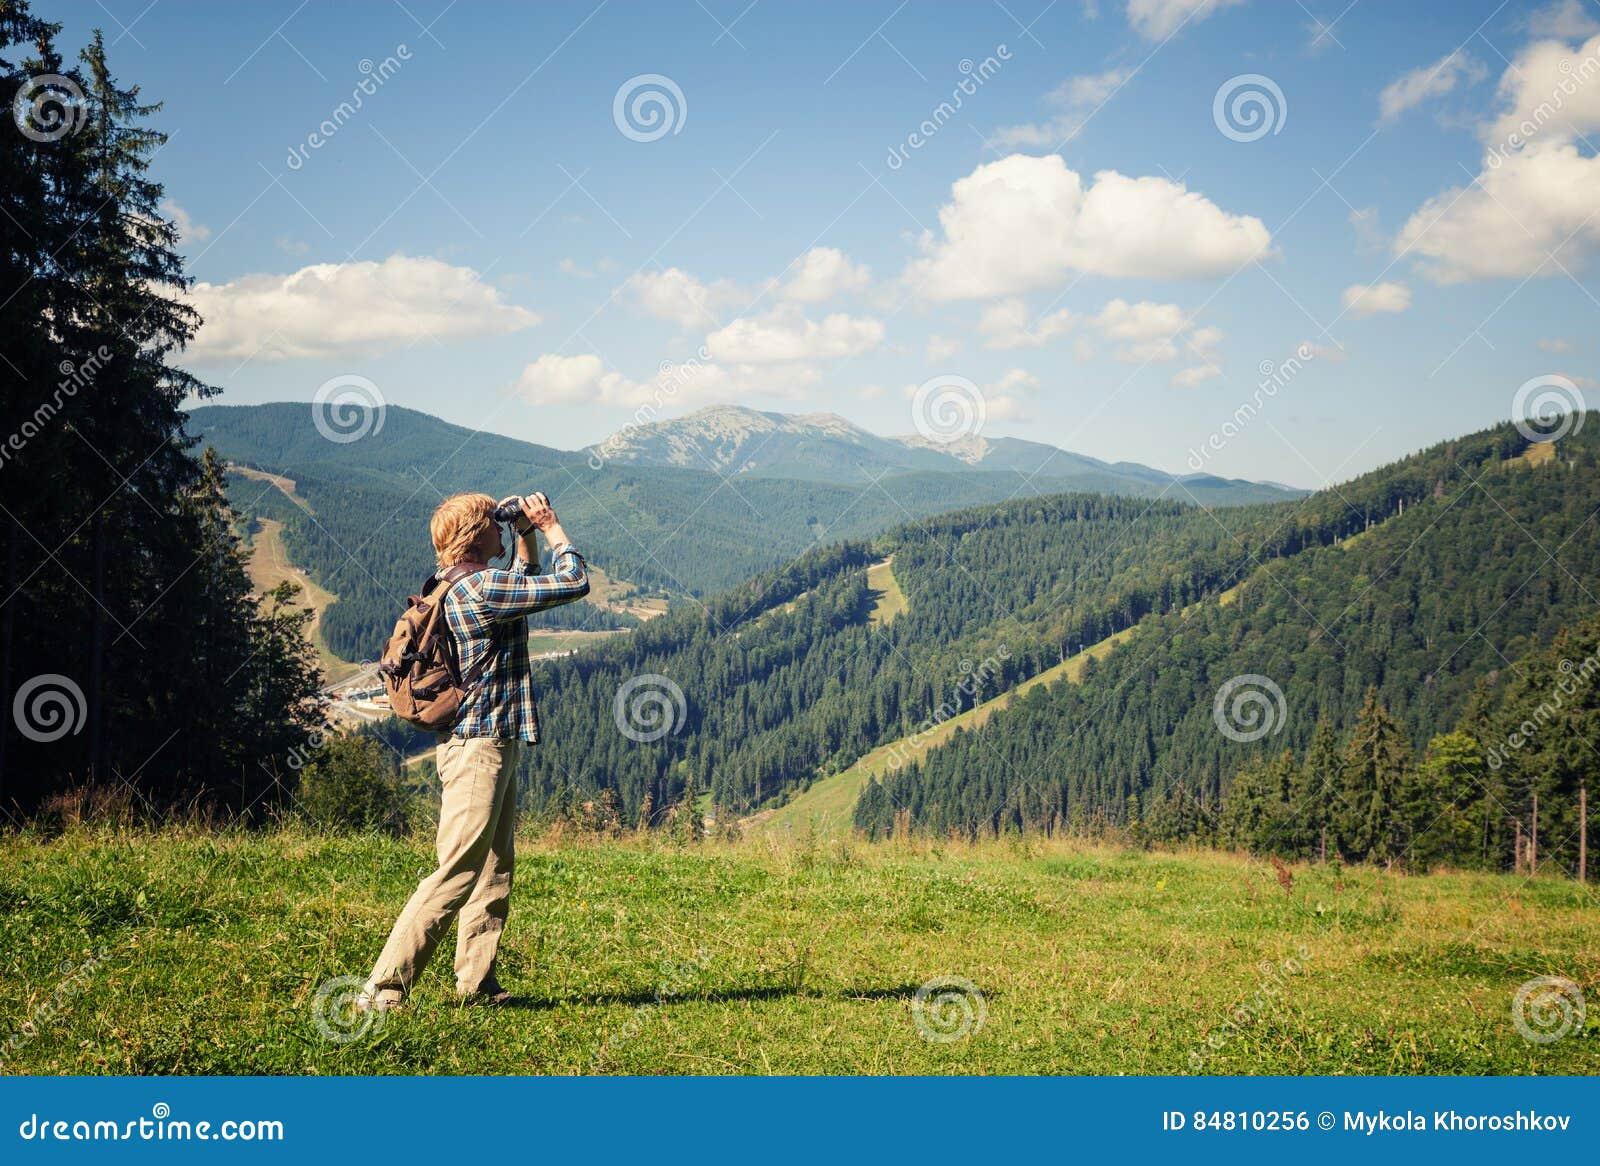 Download Young Traveler Enjoying Mountain View Stock Photo - Image of activity, walk: 84810256